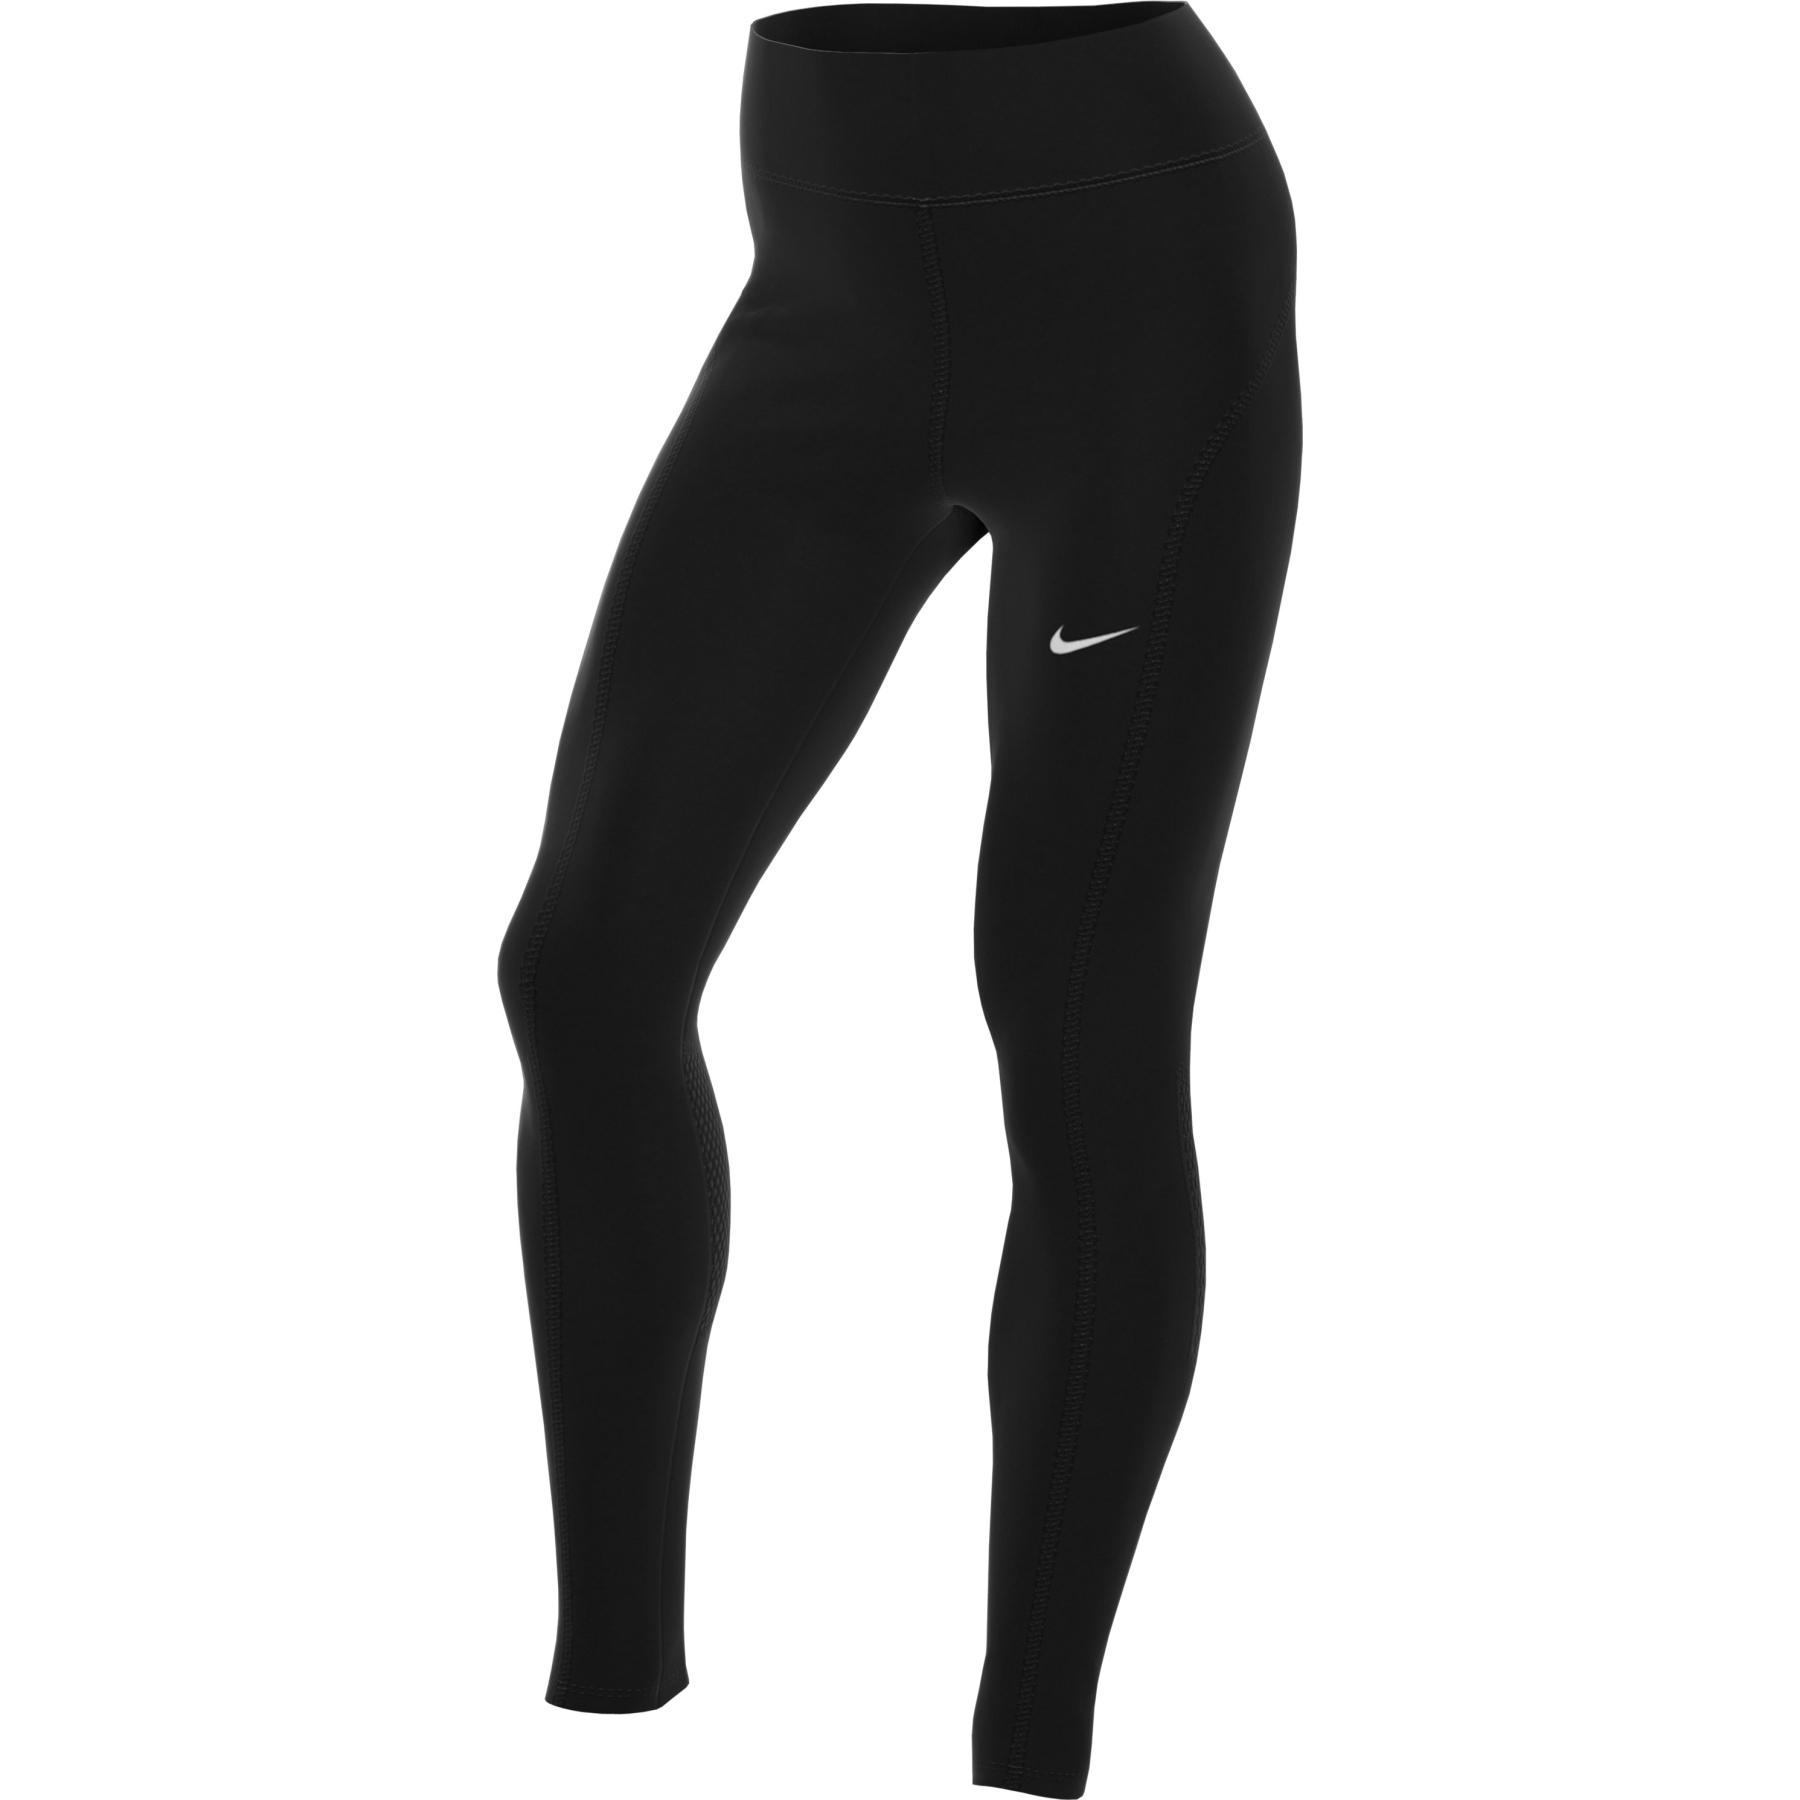 Nike Epic Fast Damen-Lauftights - black/reflective silver CZ9240-010